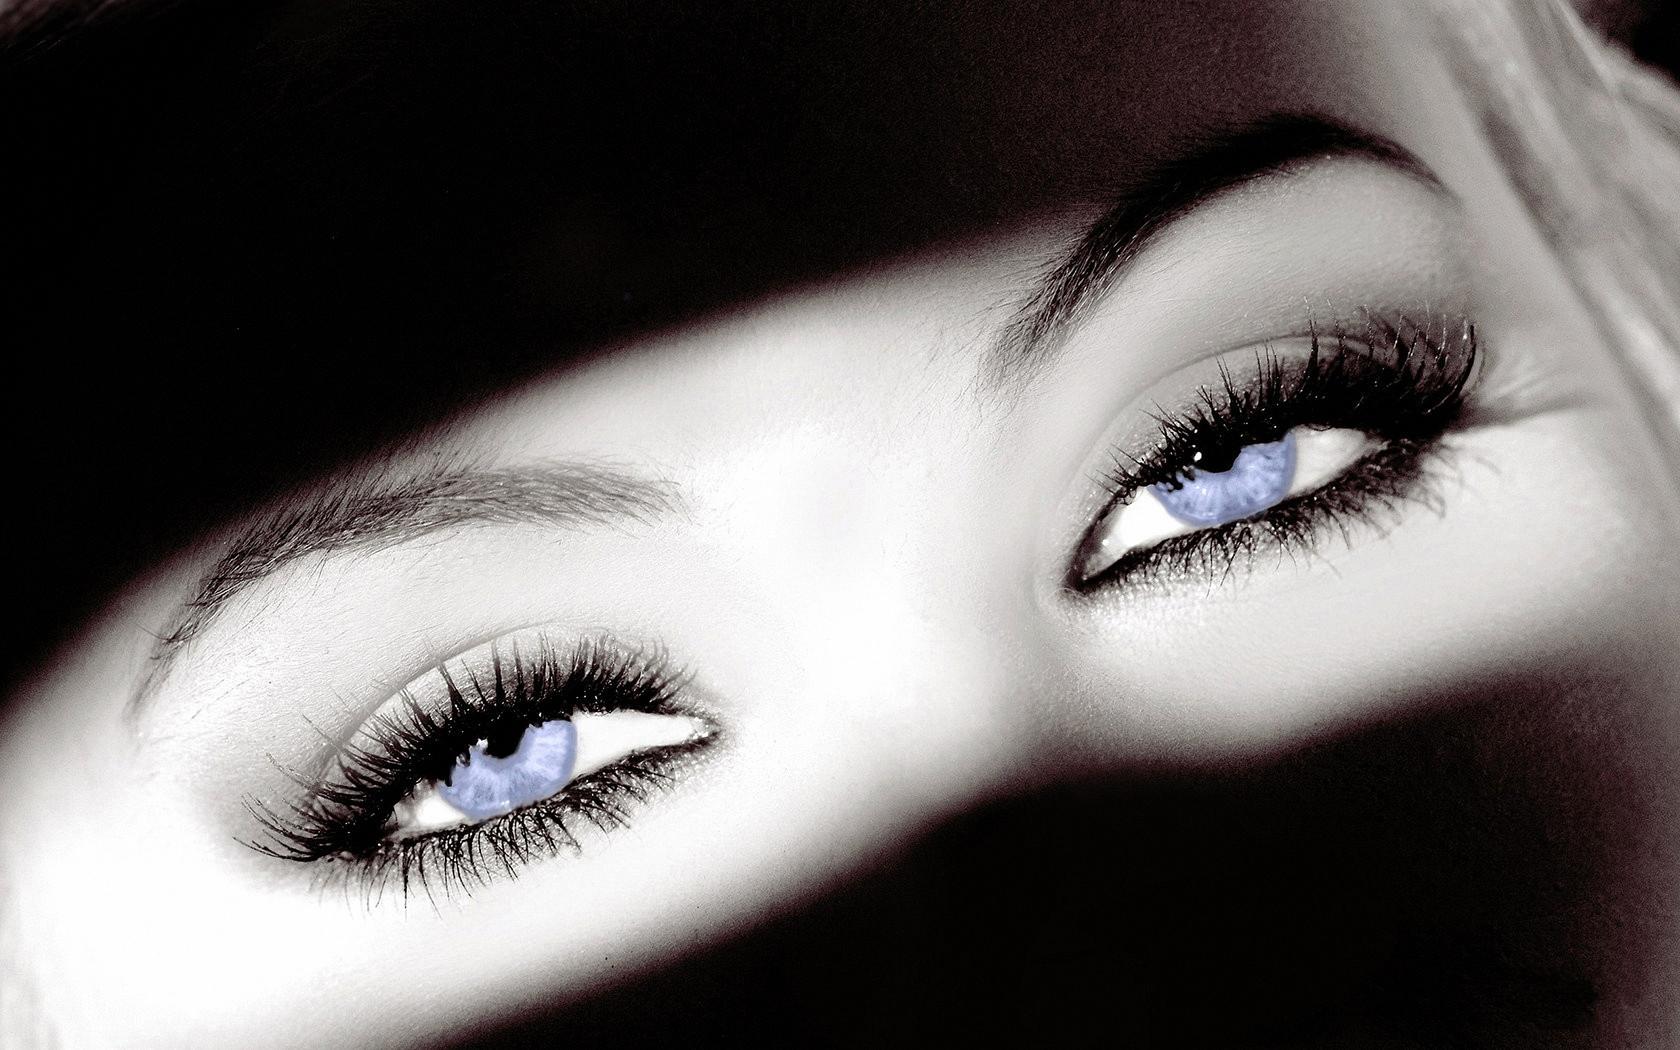 лицо, девушка, взгляд, глаза, макро, чб фото